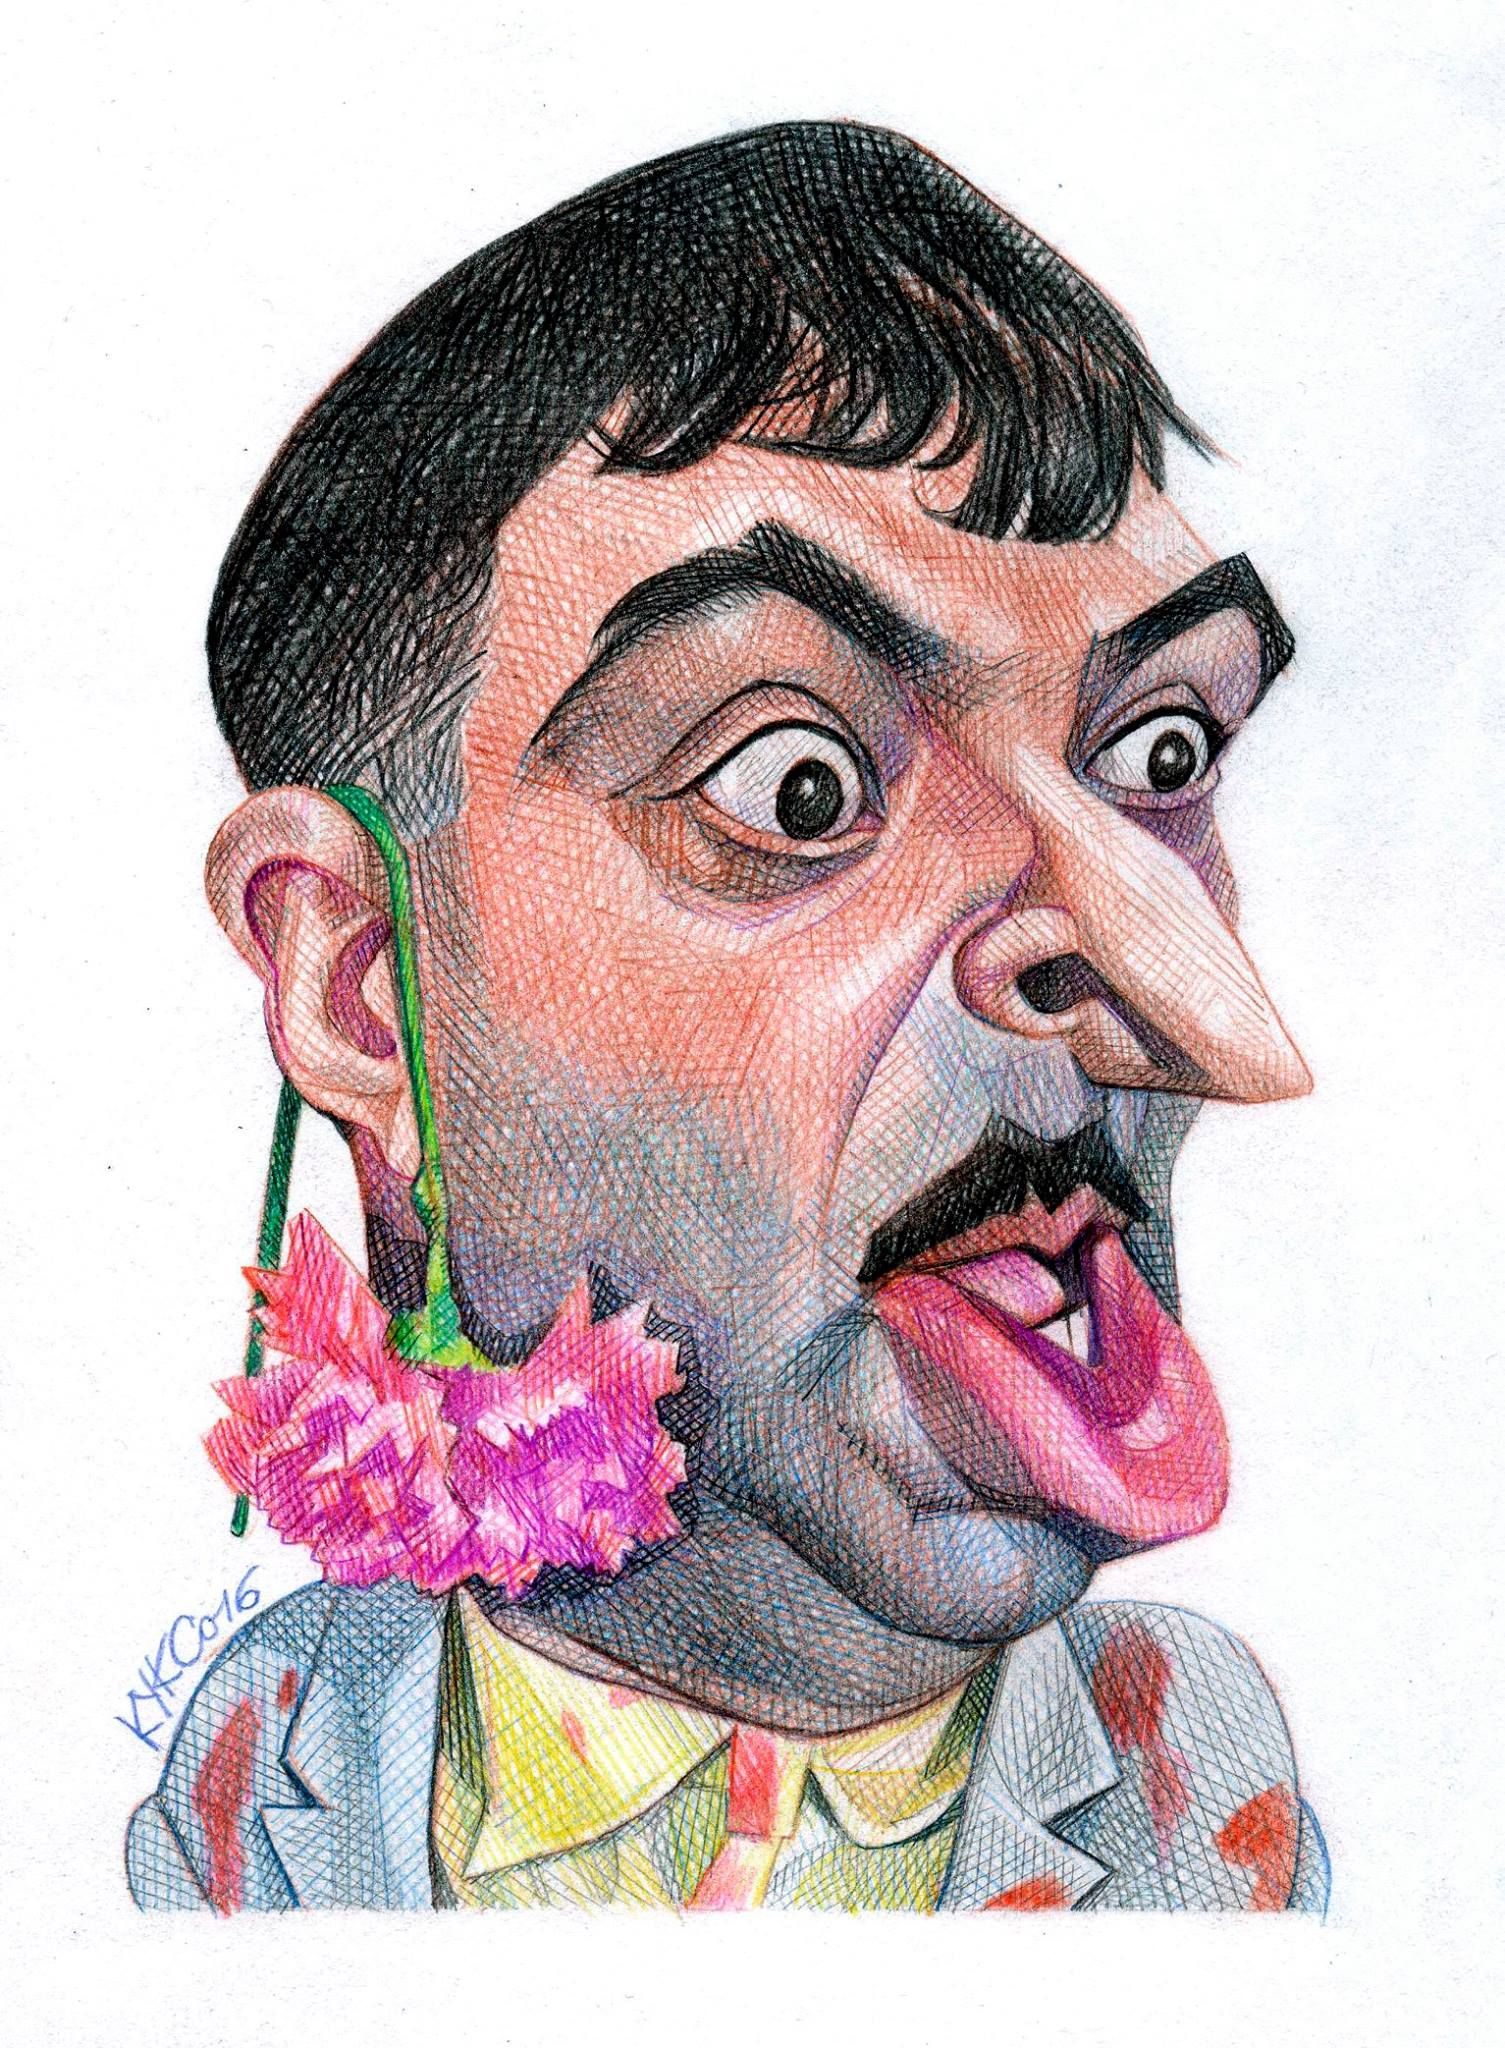 Картинки смешного нарисованного человека